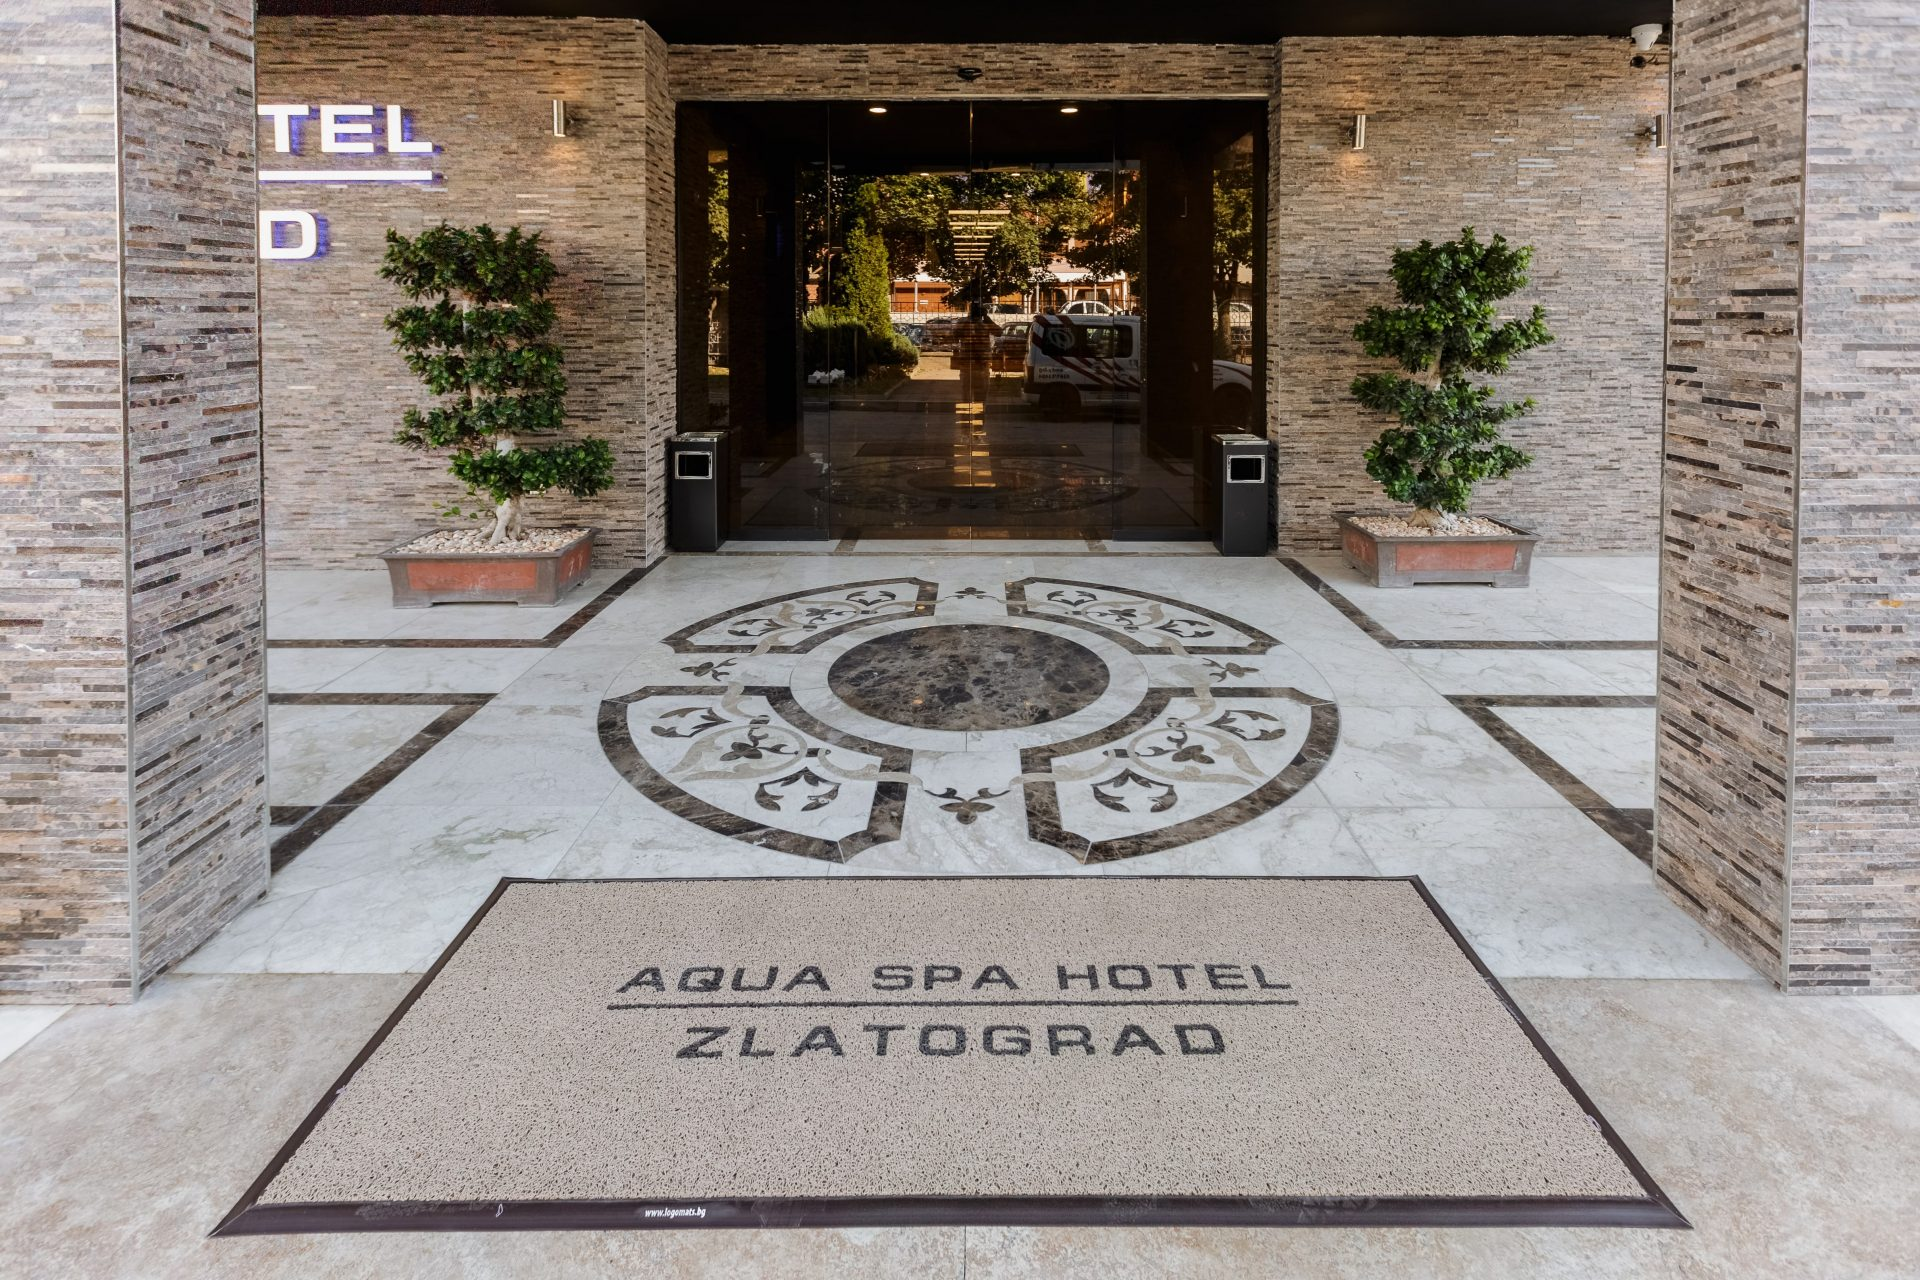 Аква Спа Хотел Златоград